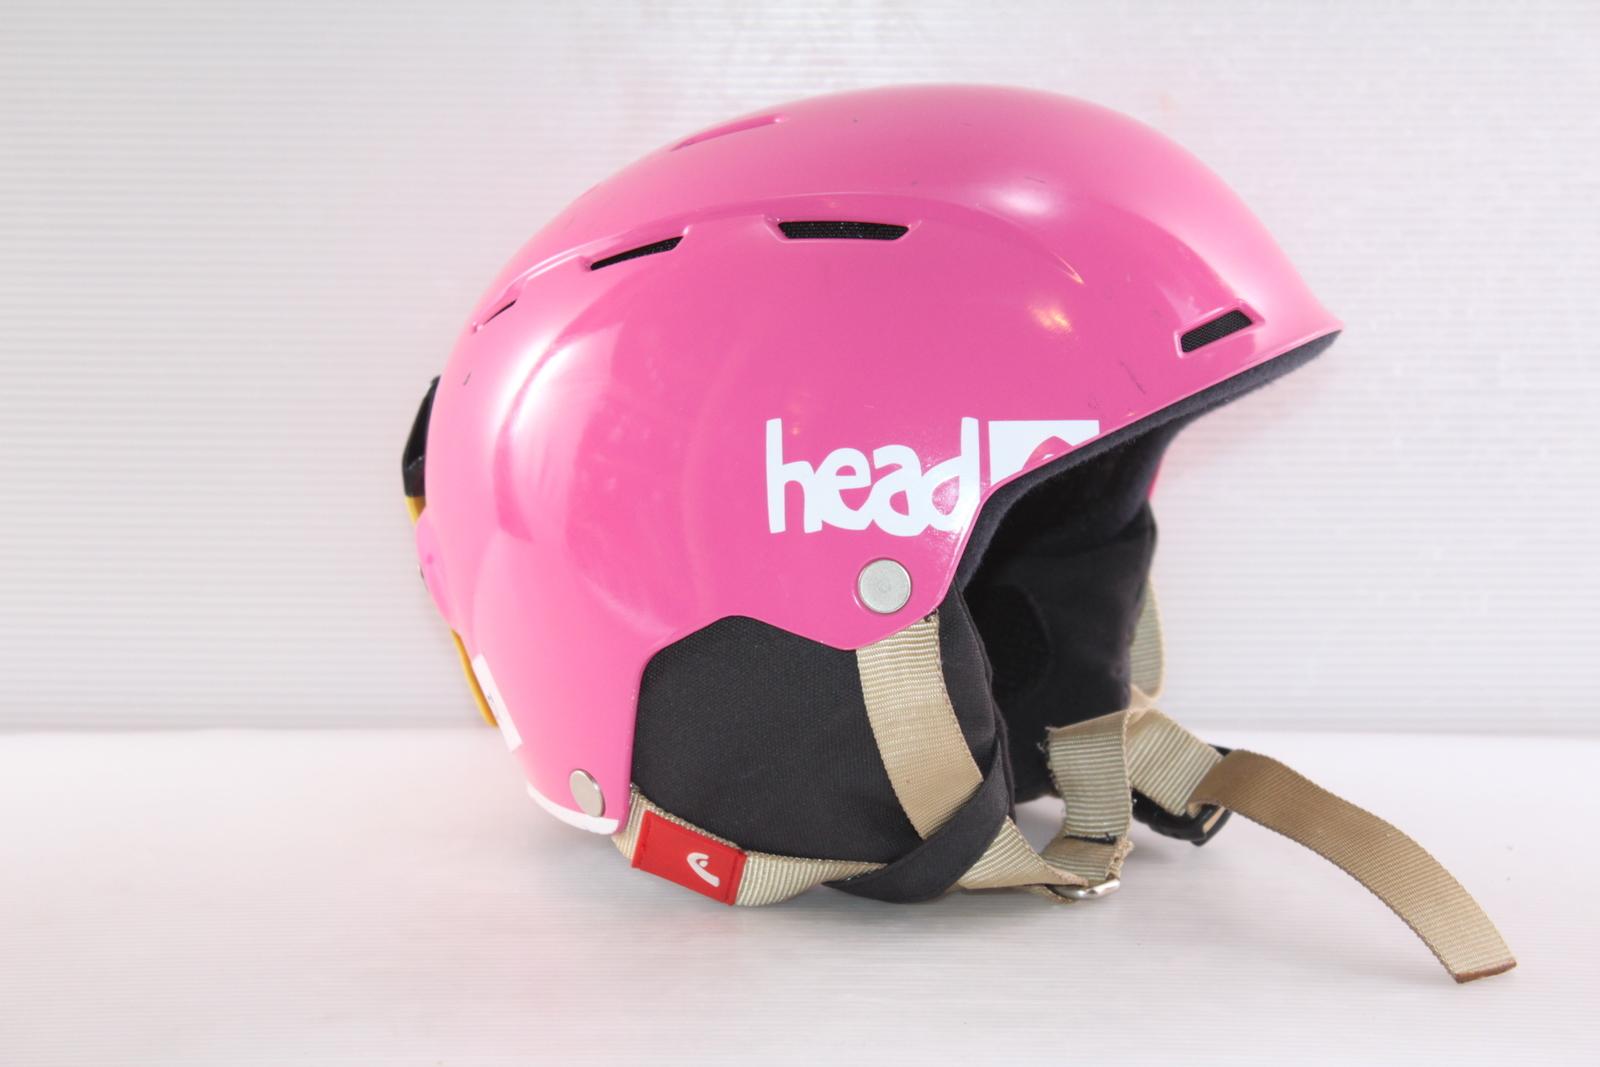 Dívčí lyžařská helma Head Air Youth Pink - posuvná vel. 48 - 51